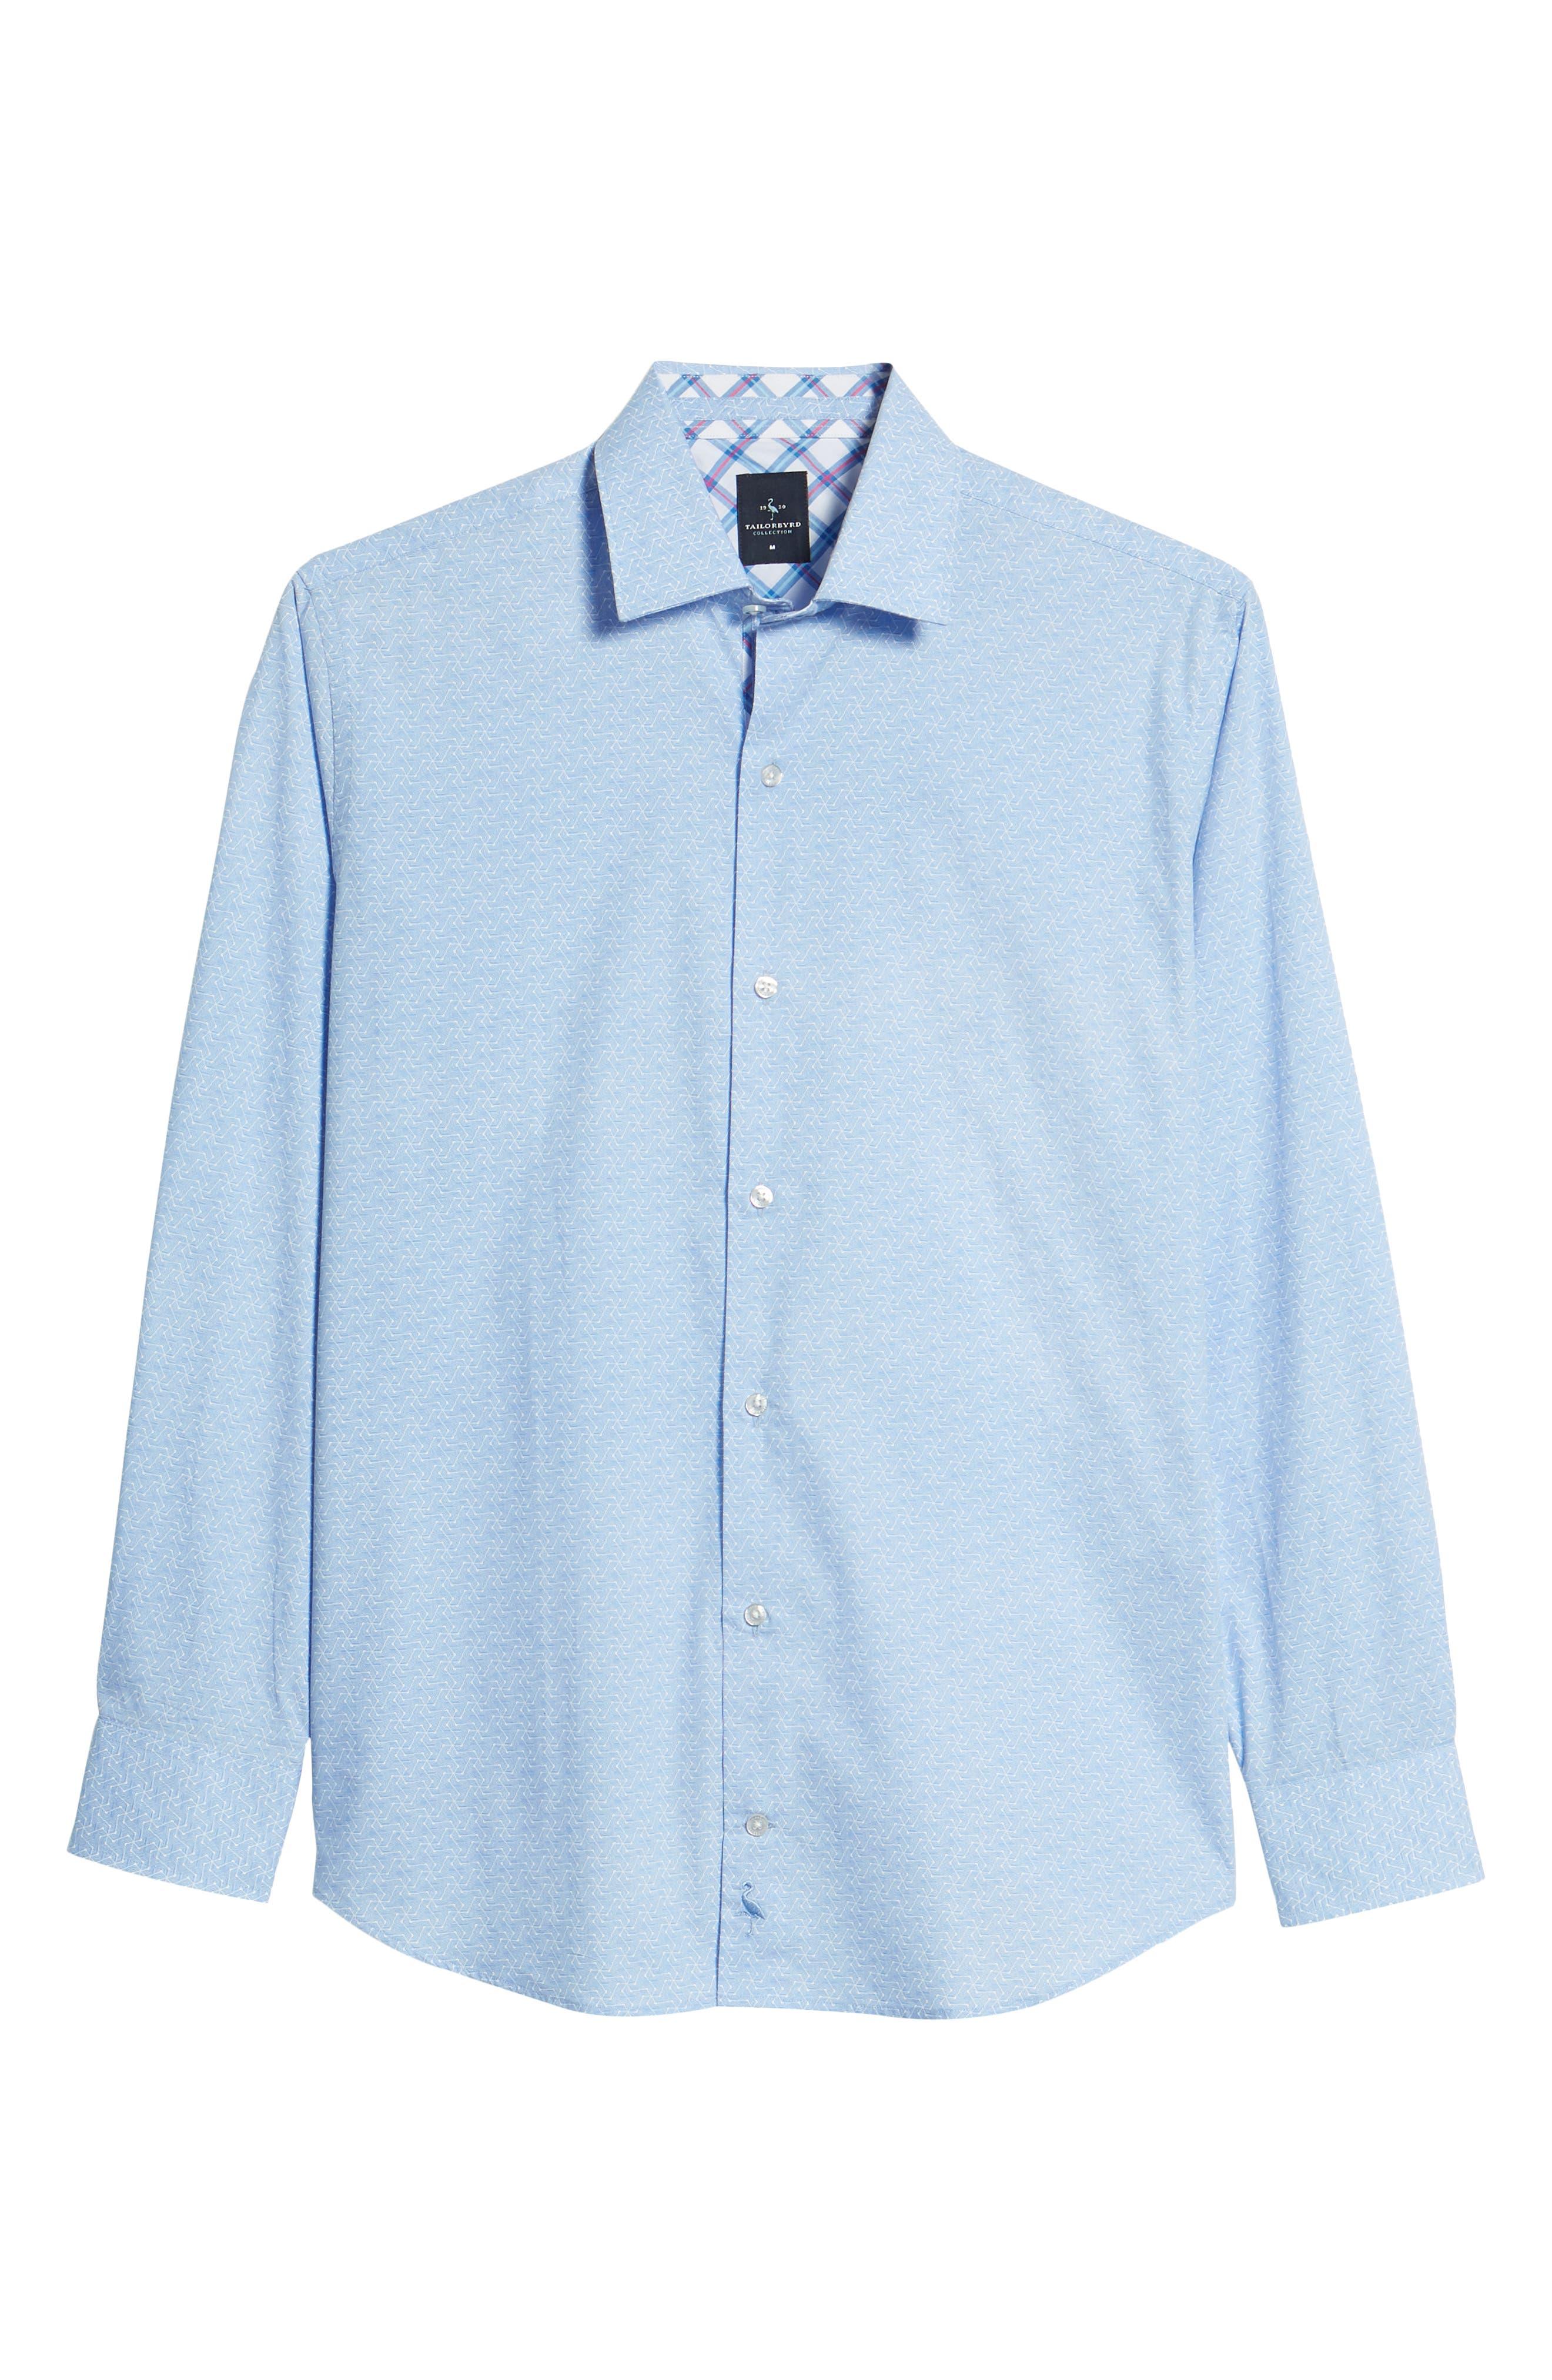 Beckham Regular Fit Plaid Sport Shirt,                             Alternate thumbnail 6, color,                             Light Blue